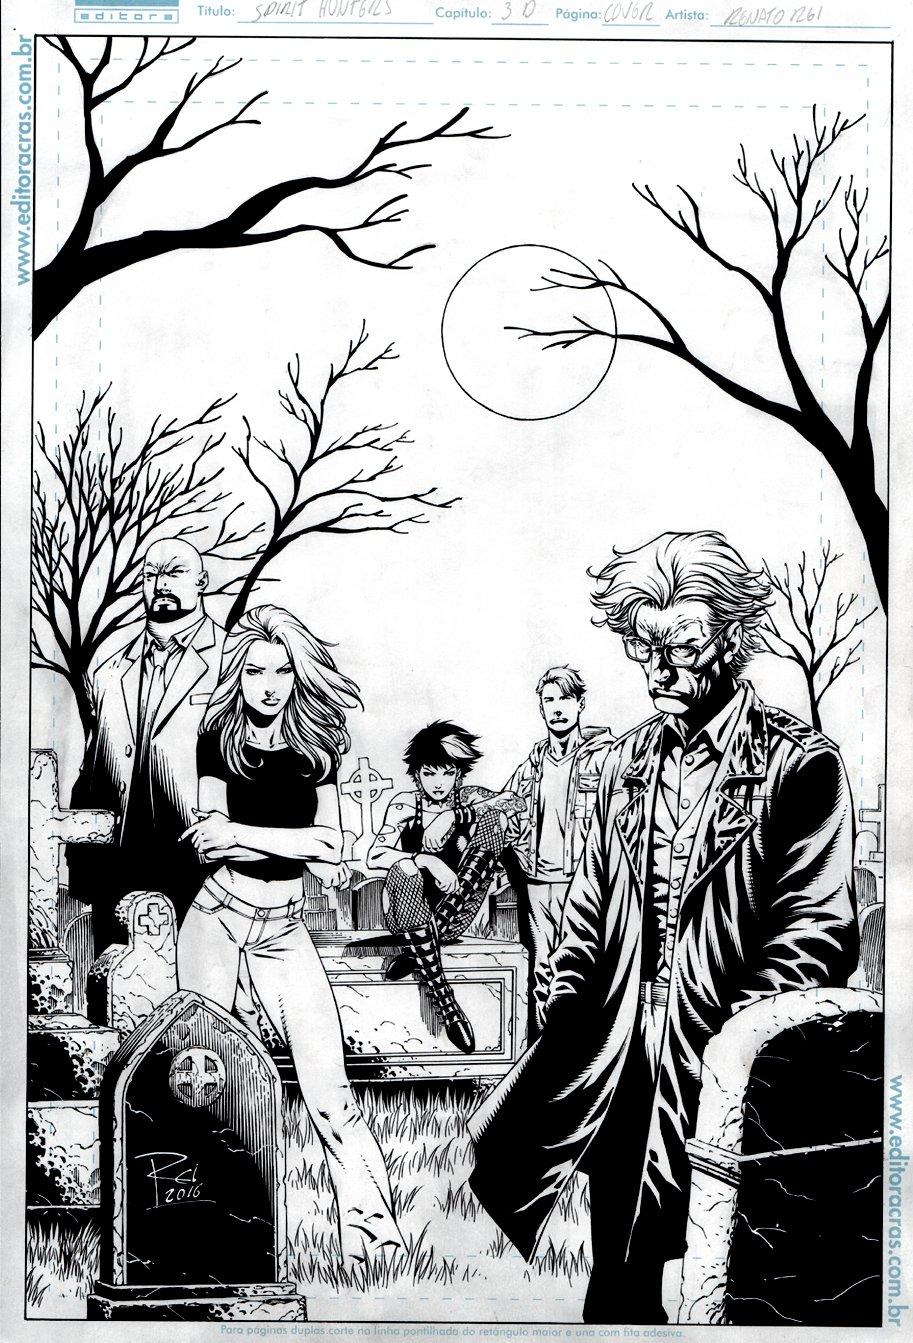 Spirit Hunters #3 Cover (2016)